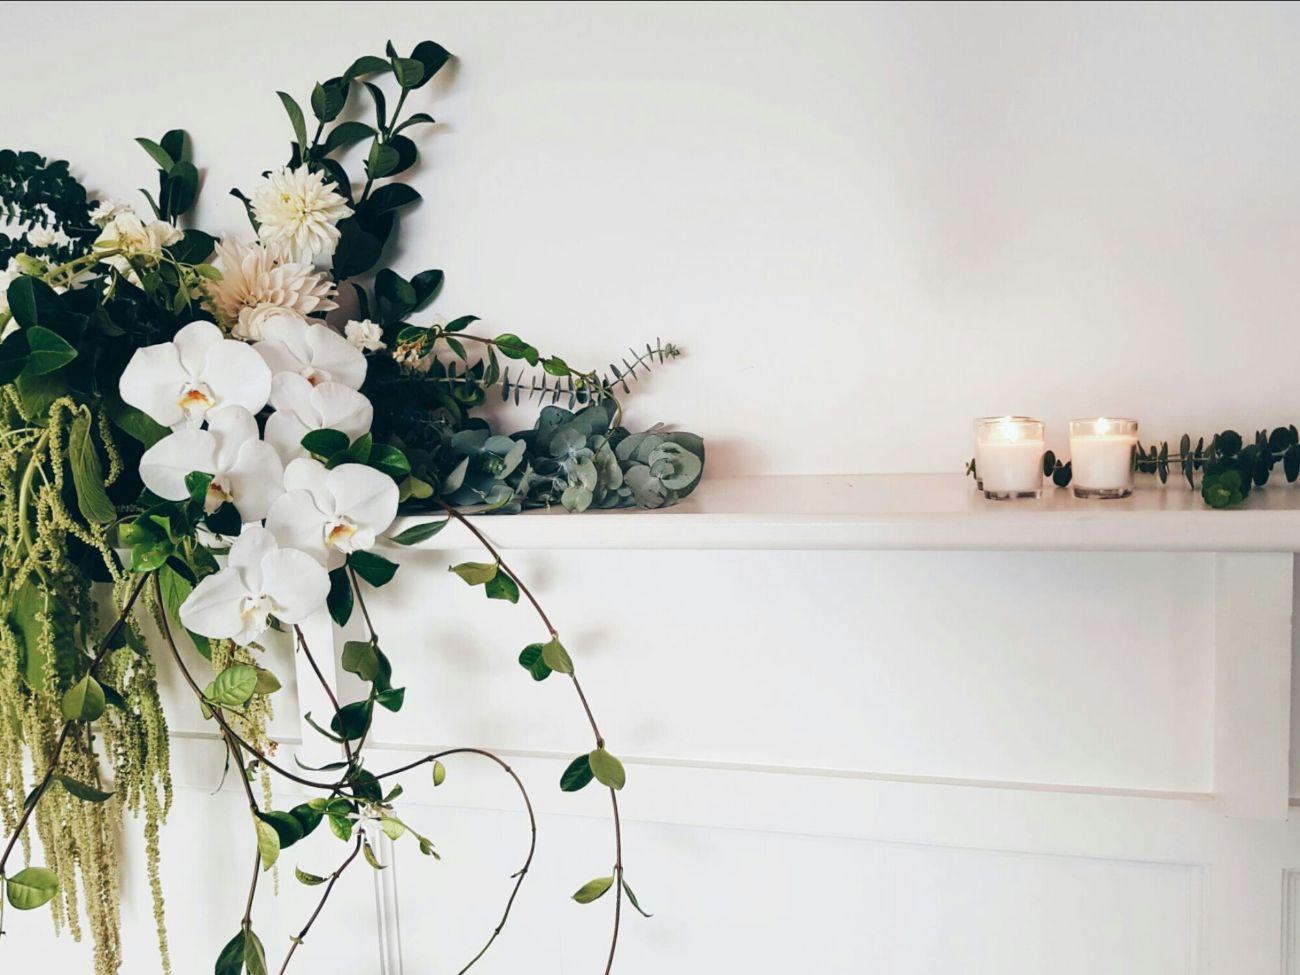 aviary image sydney wedding designer stylist planner florals styling wedding sydney